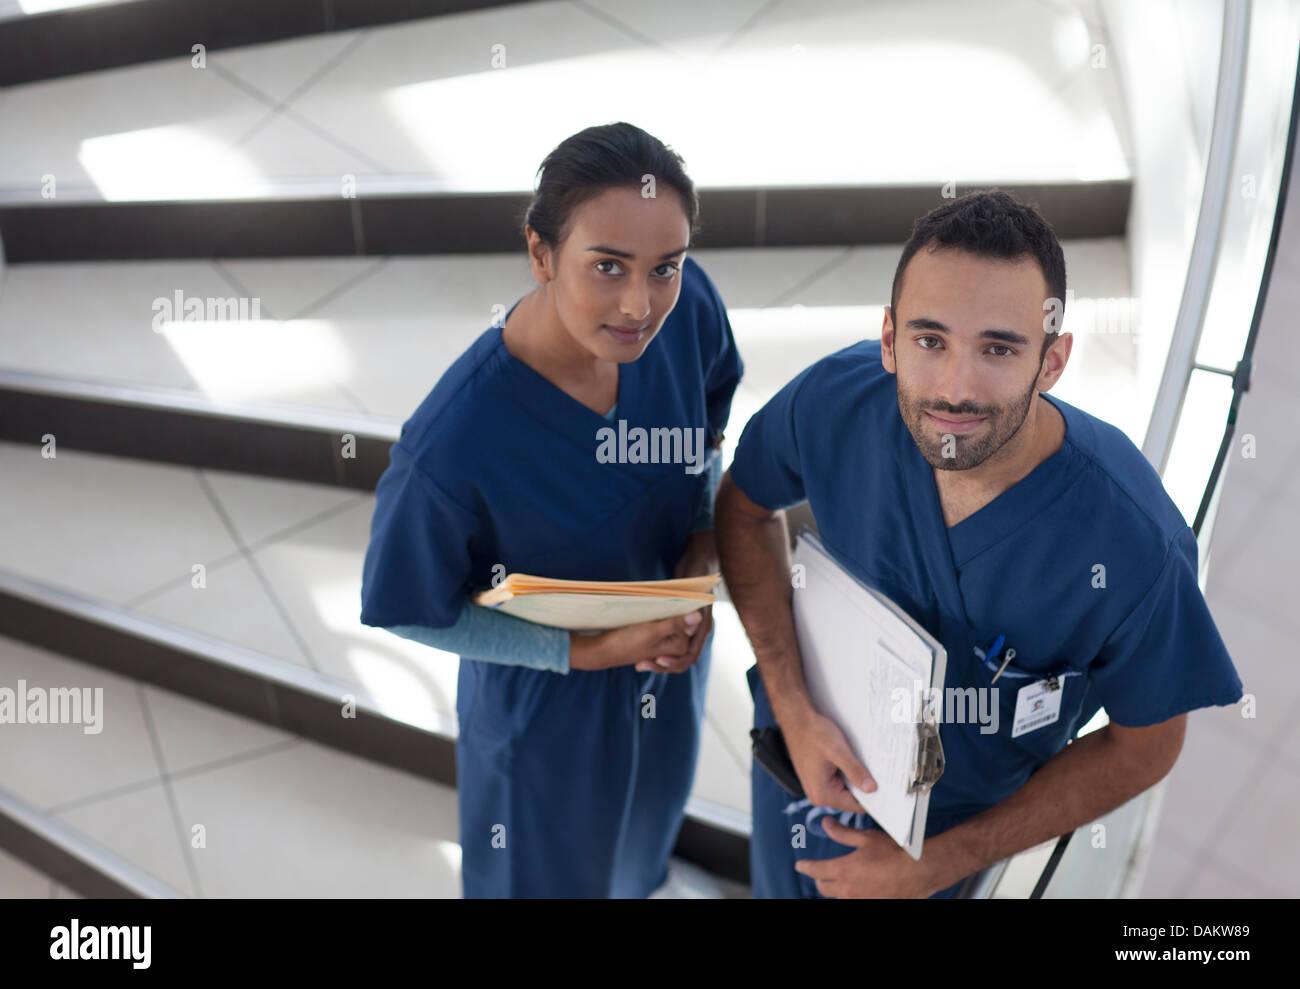 Nurses standing on hospital steps - Stock Image